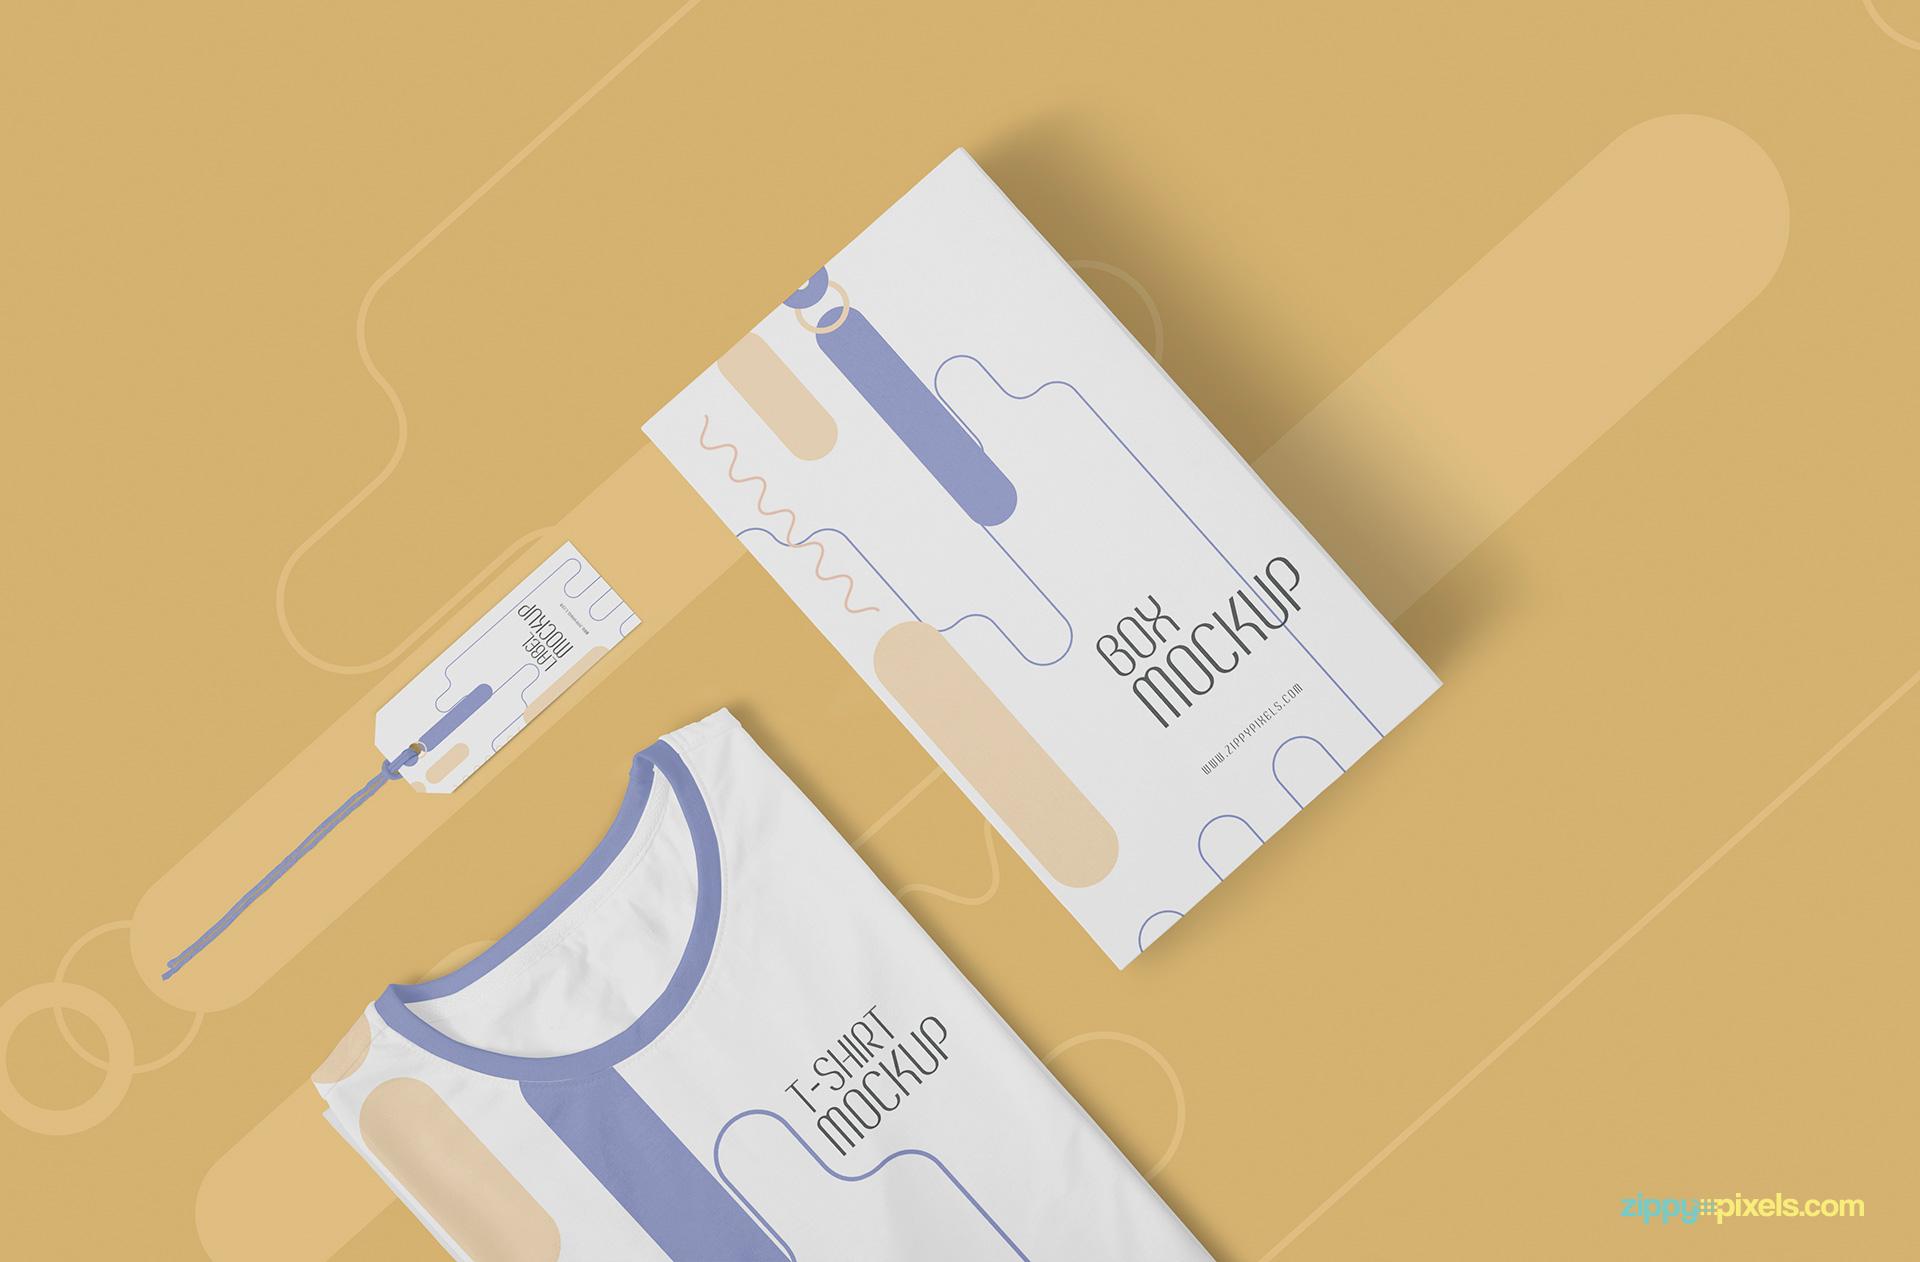 Free TShirt Mockup Template ZippyPixels - Property of t shirt template